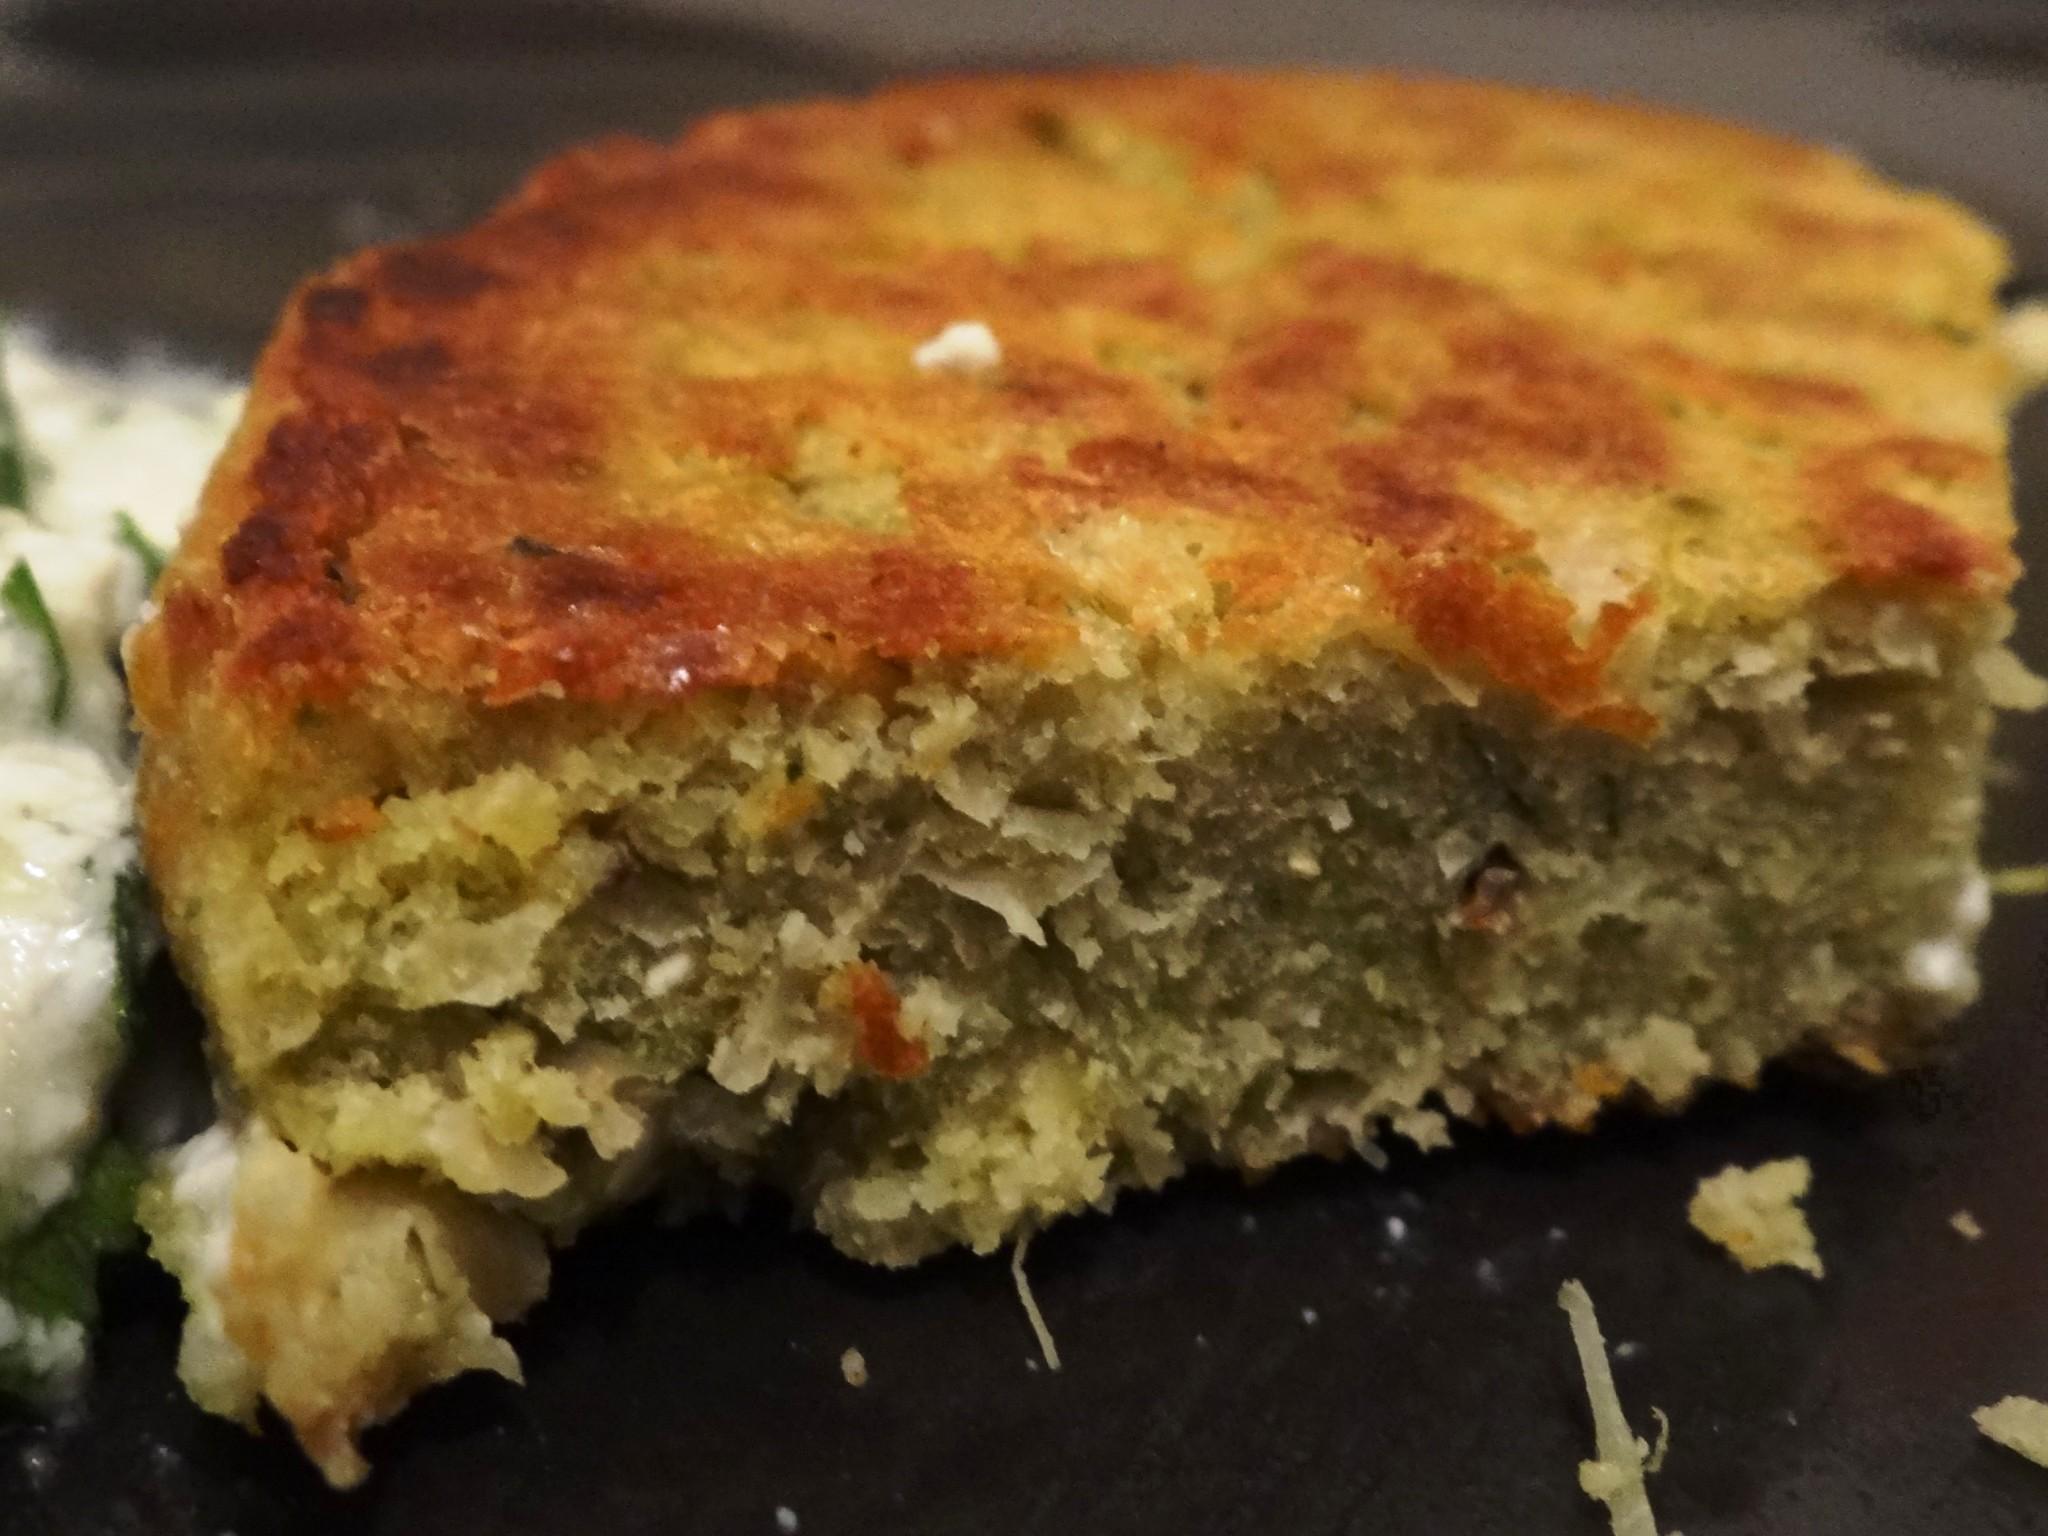 Fleanette's Kitchen - Falafels maison, steacks VG...